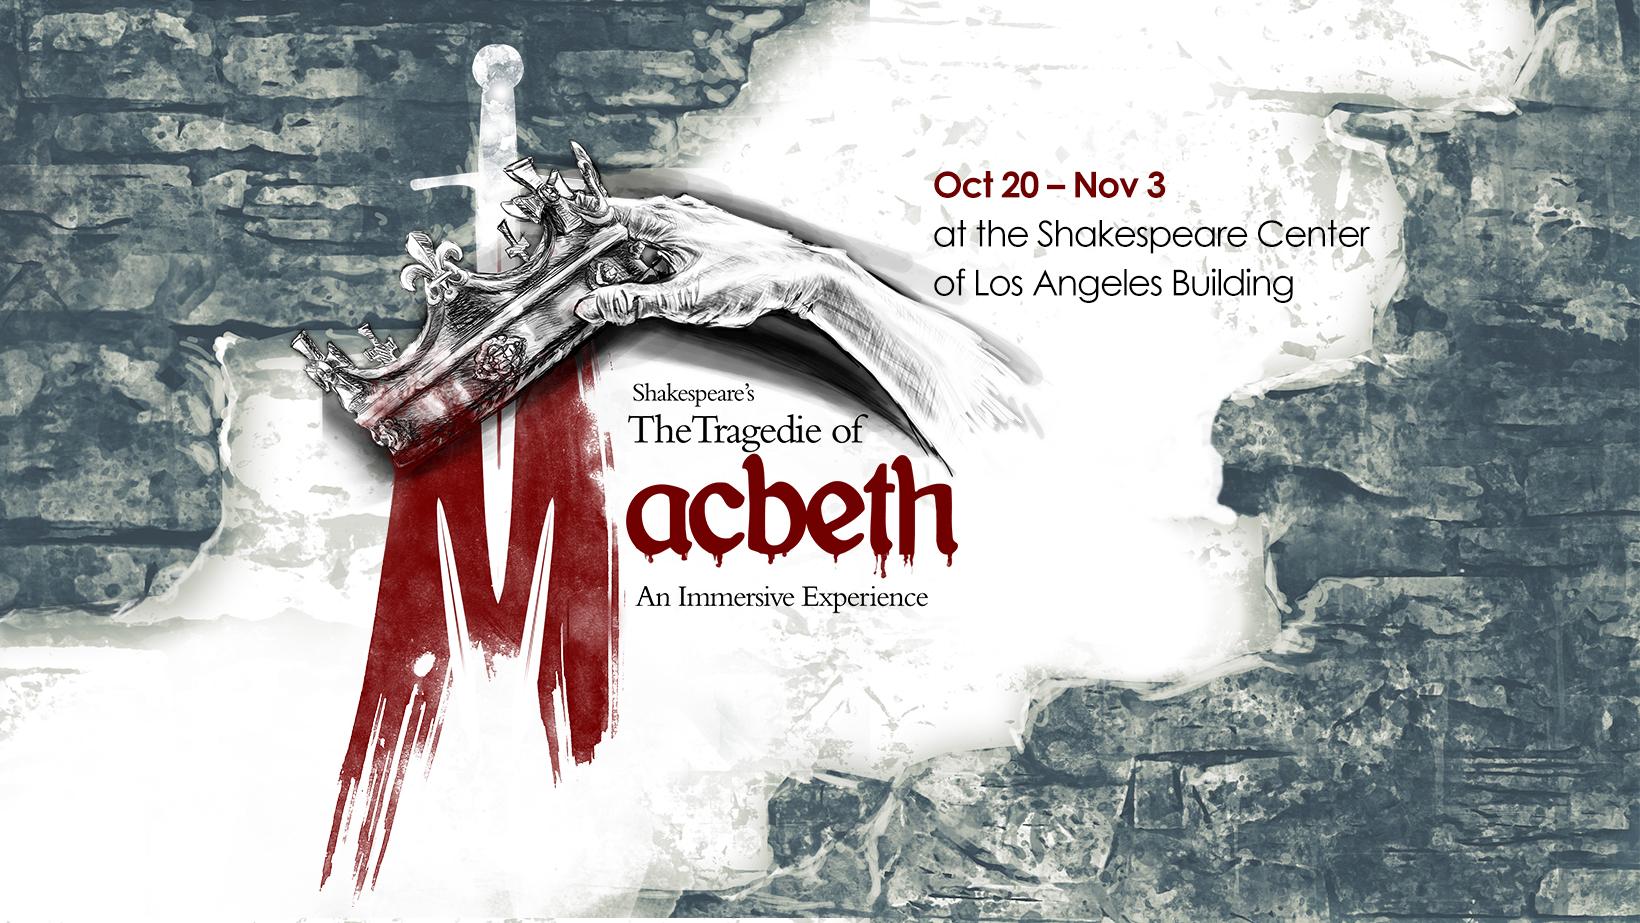 The Tragedie of Macbeth - Halloween Immersive ExperienceOctober - November 2018